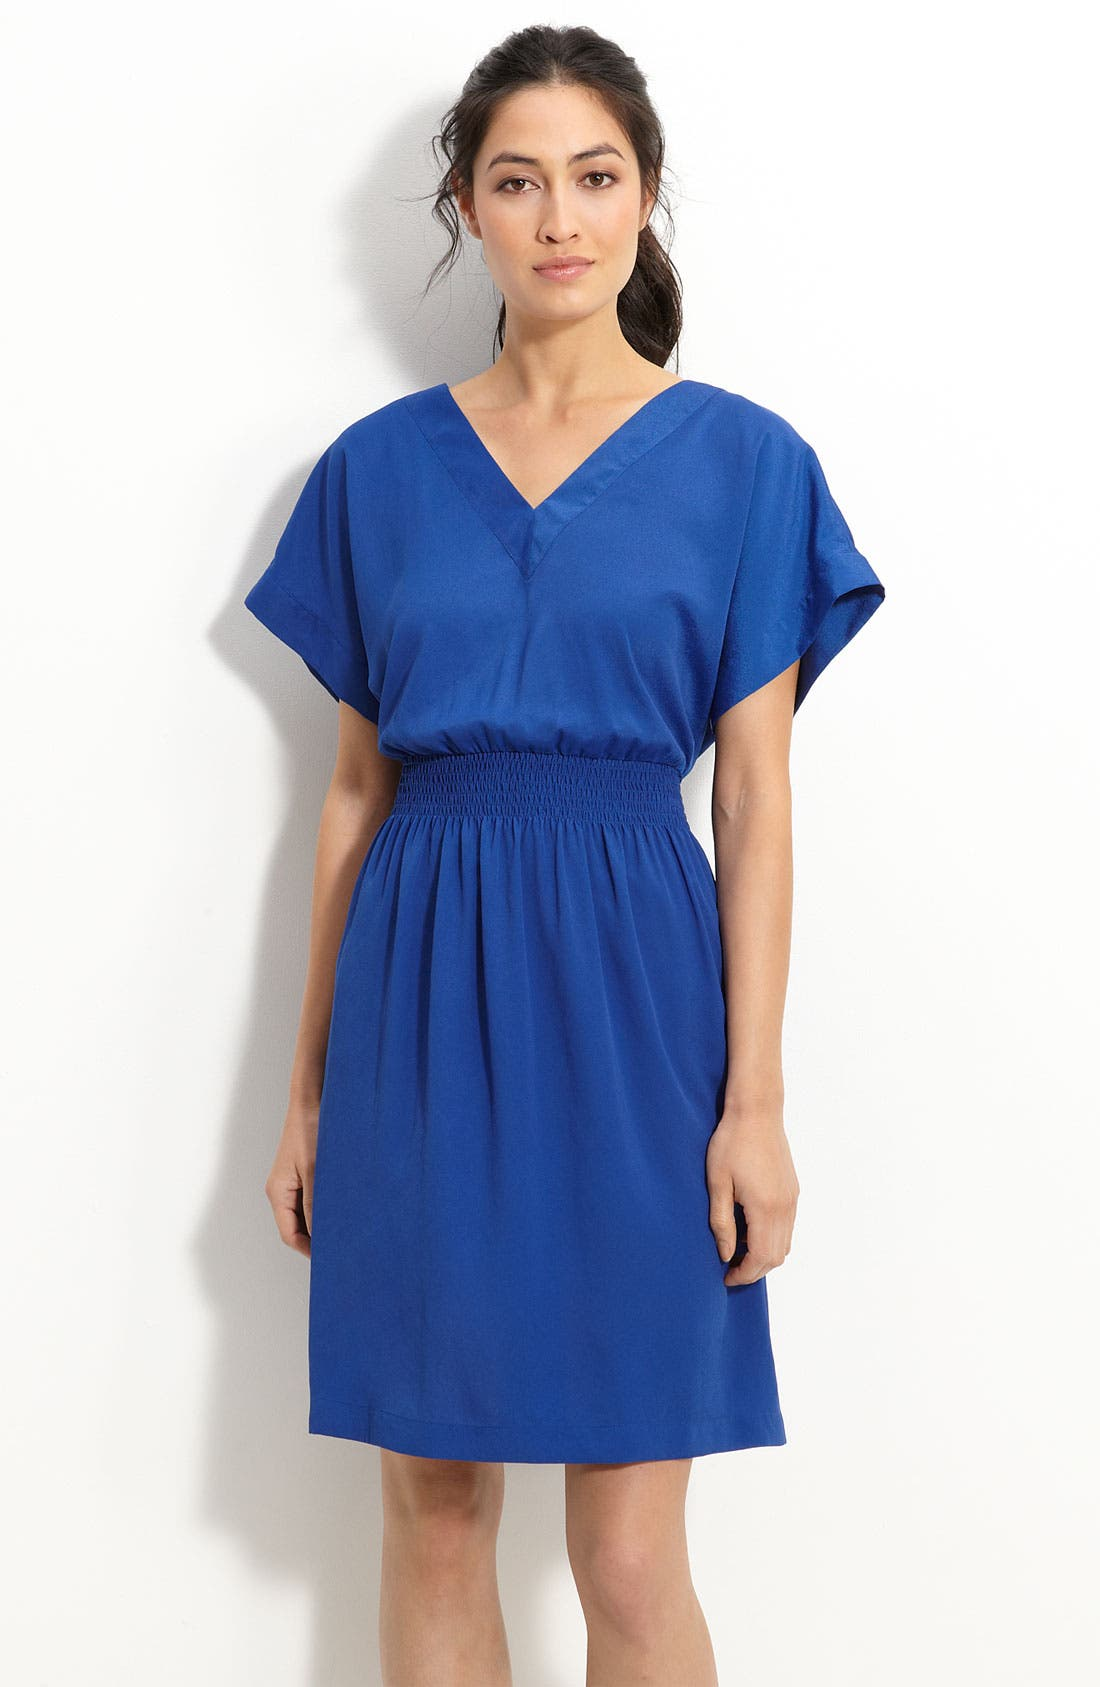 Alternate Image 1 Selected - Suzi Chin for Maggy Boutique Blouson Crêpe de Chine Dress